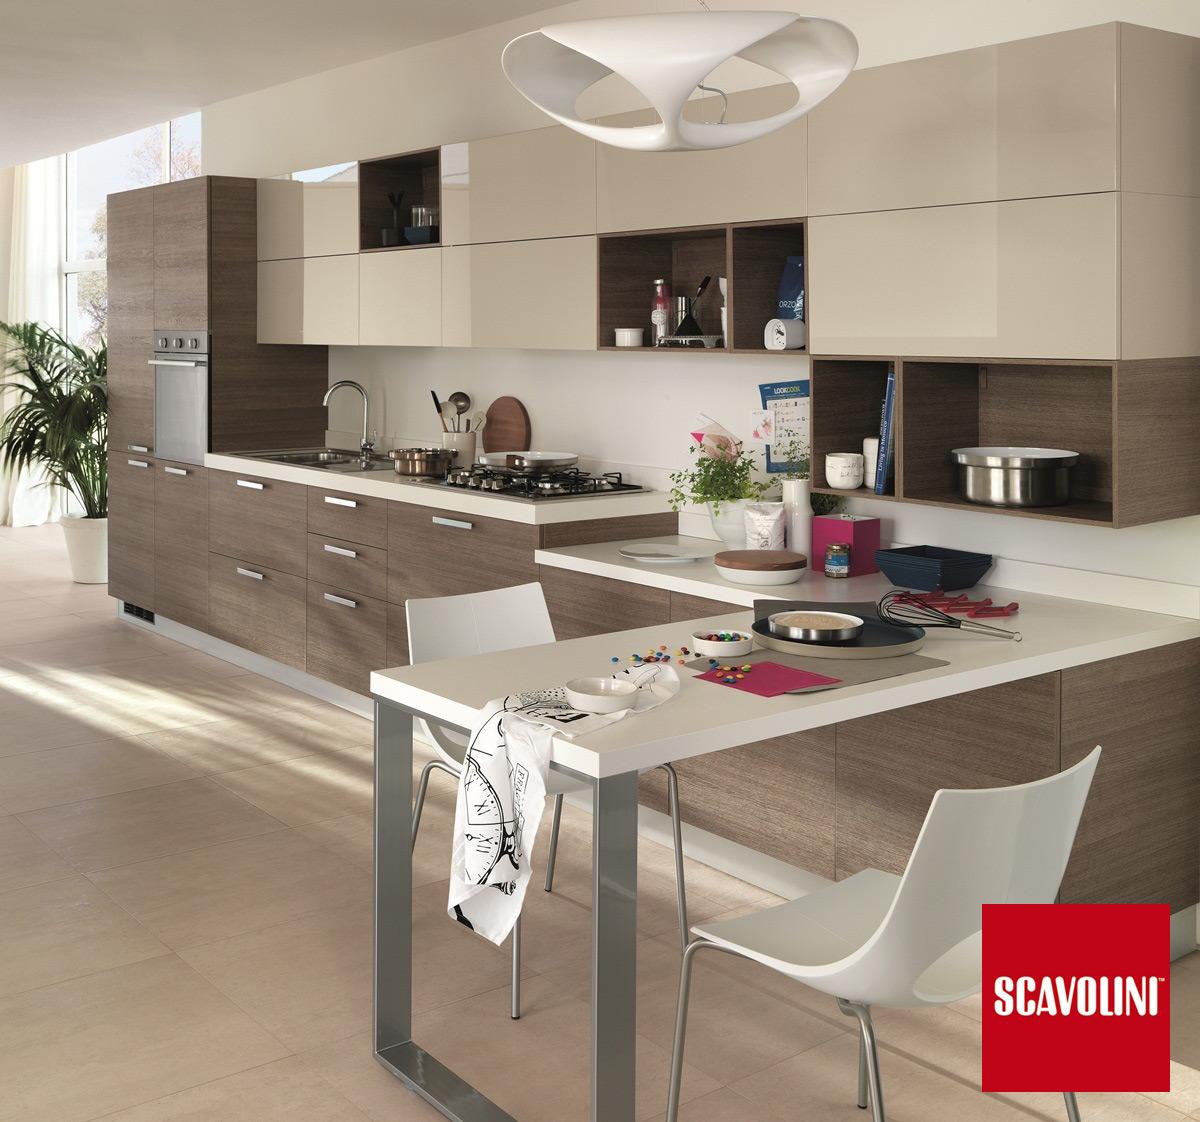 https://www.sangaetanoarredamenti.com/wp-content/uploads/2016/01/cucina-sax-scavolini-torino-13.jpg